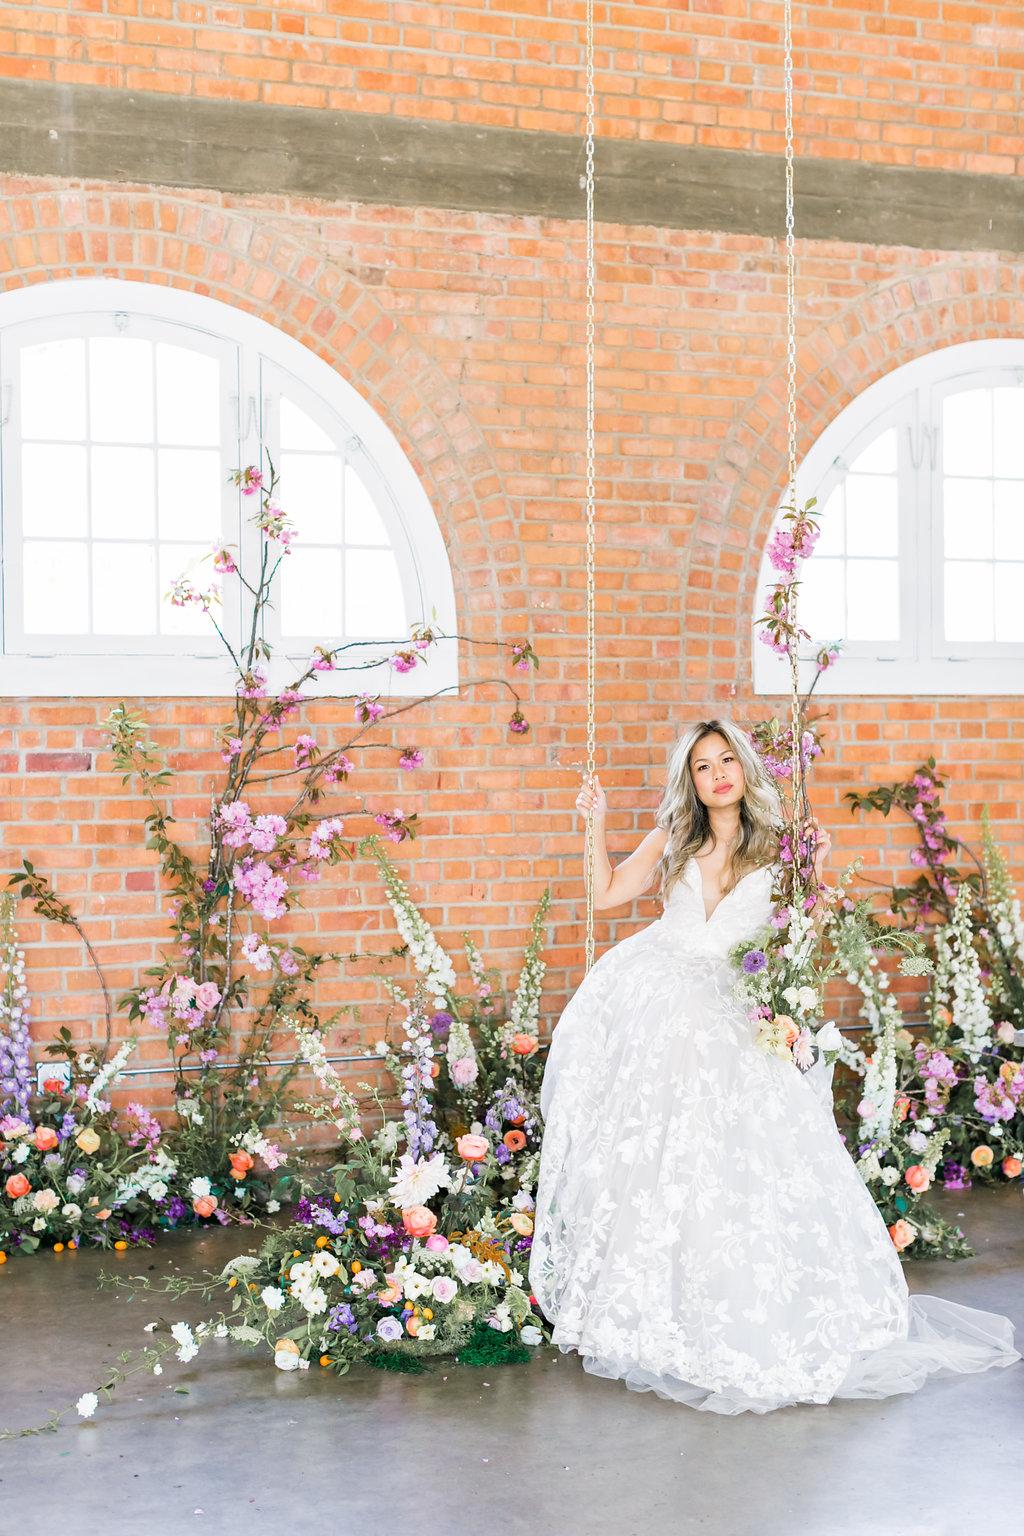 FloralBrickWeddingEditorial-NatalieSchuttPhotography-251 copy.JPG